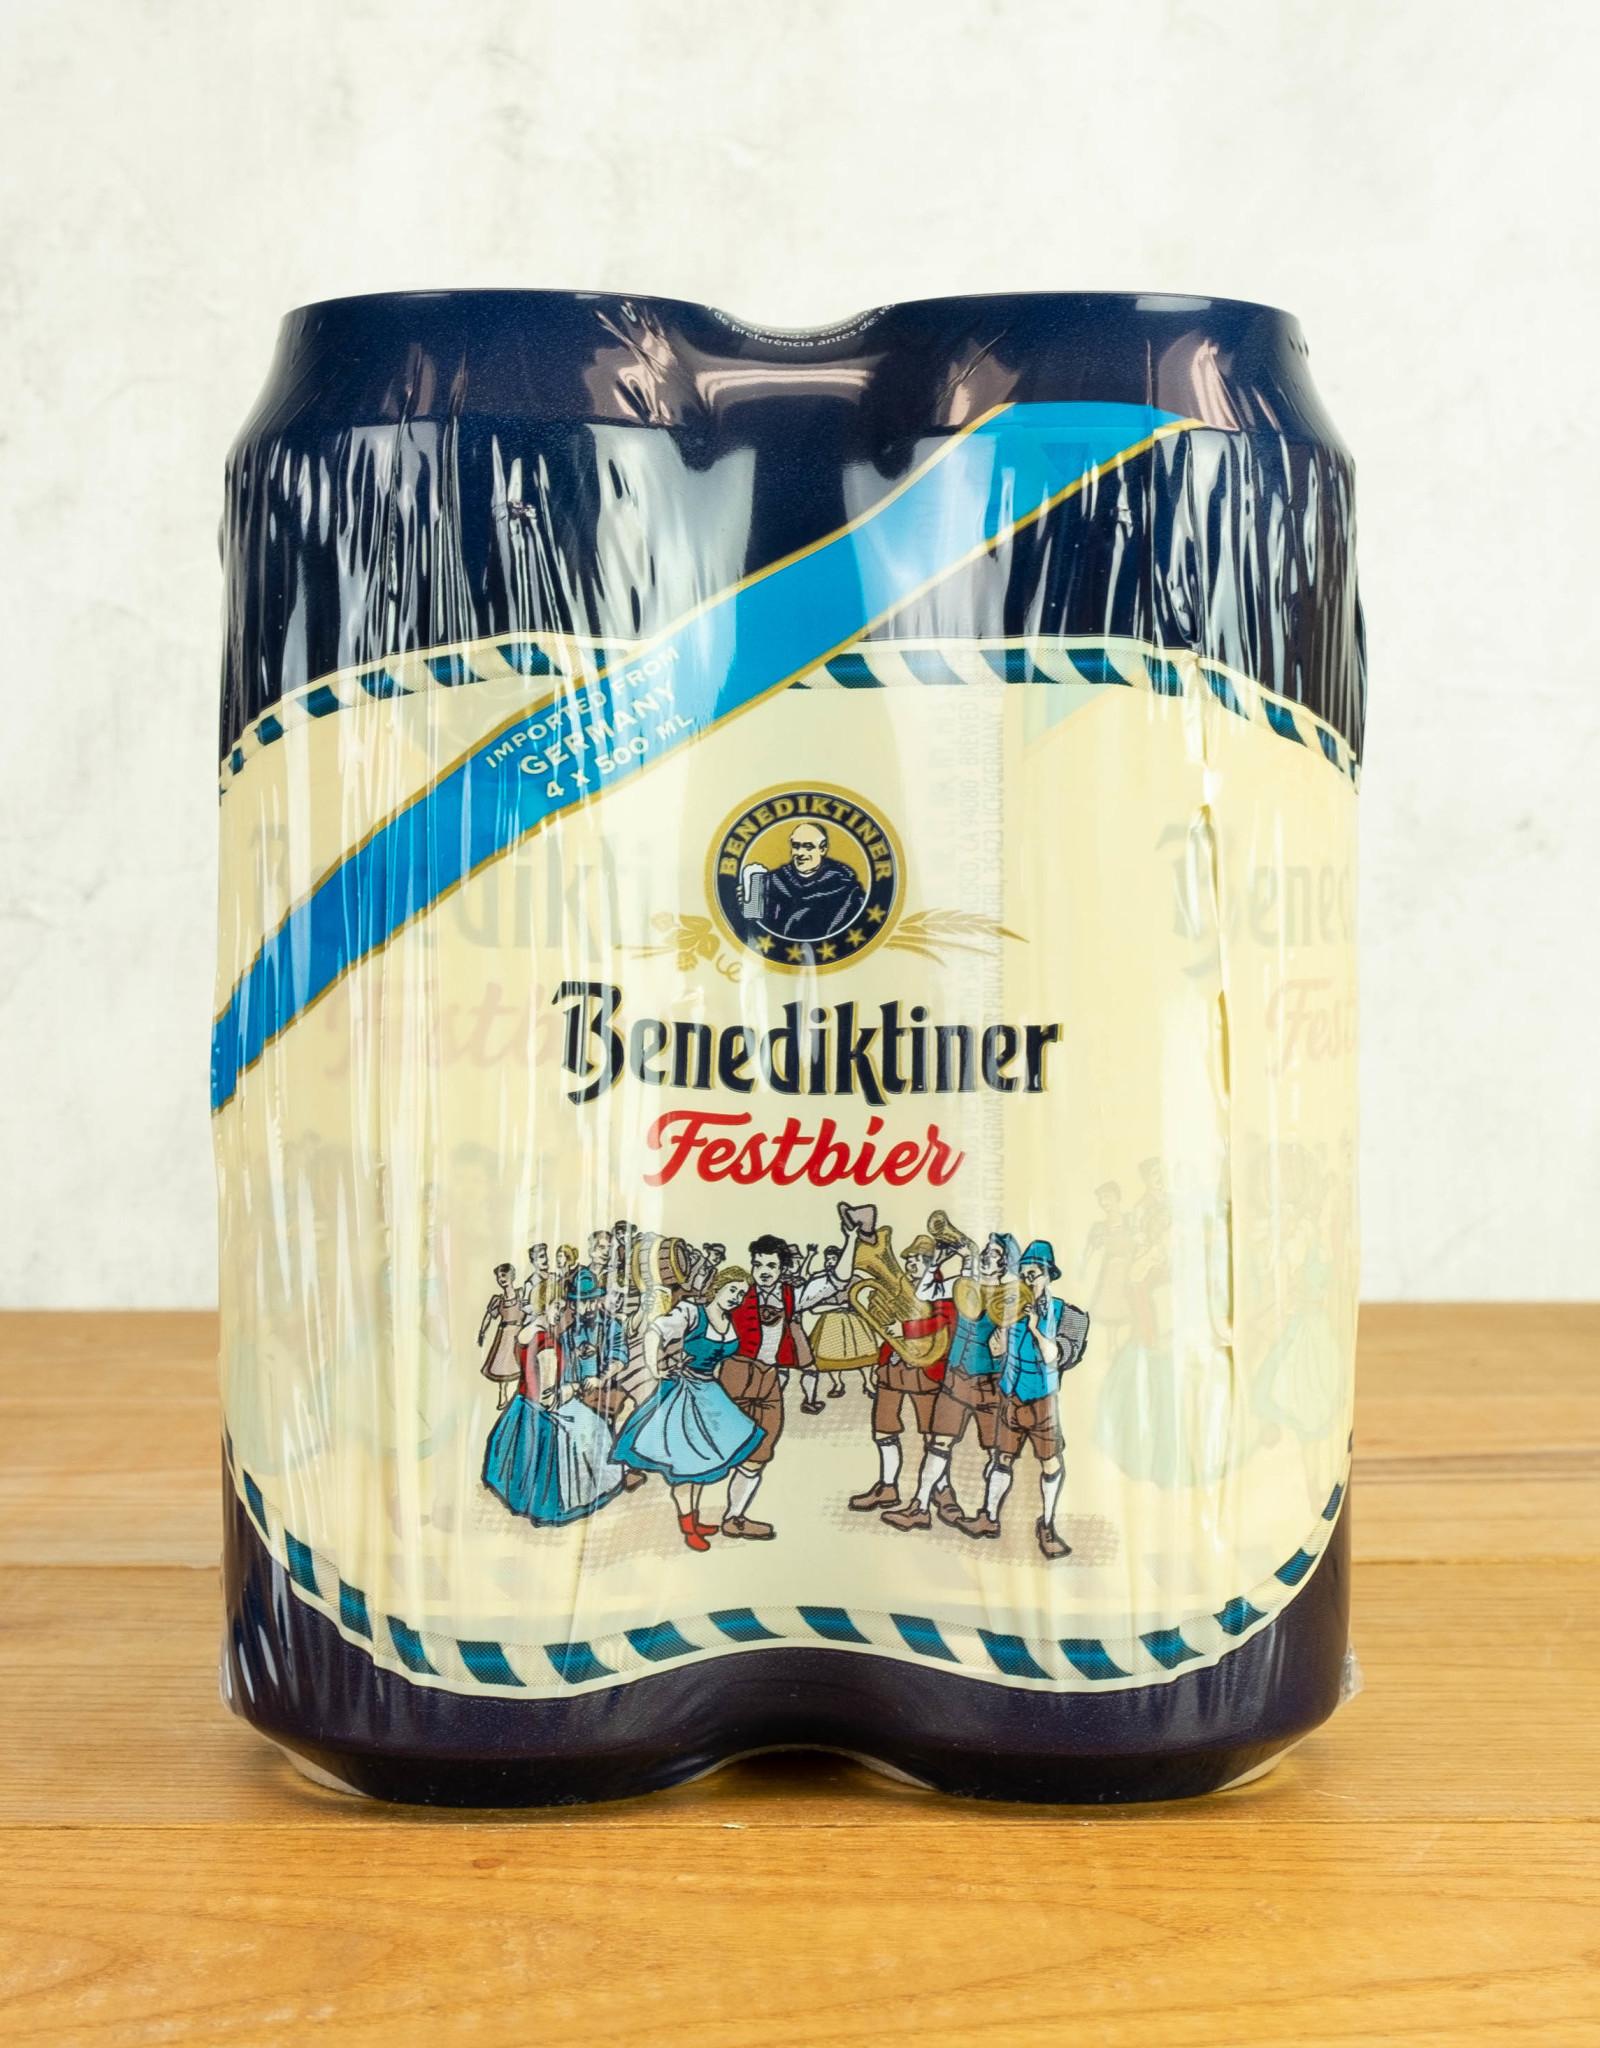 Benediktiner Festbier 4pk